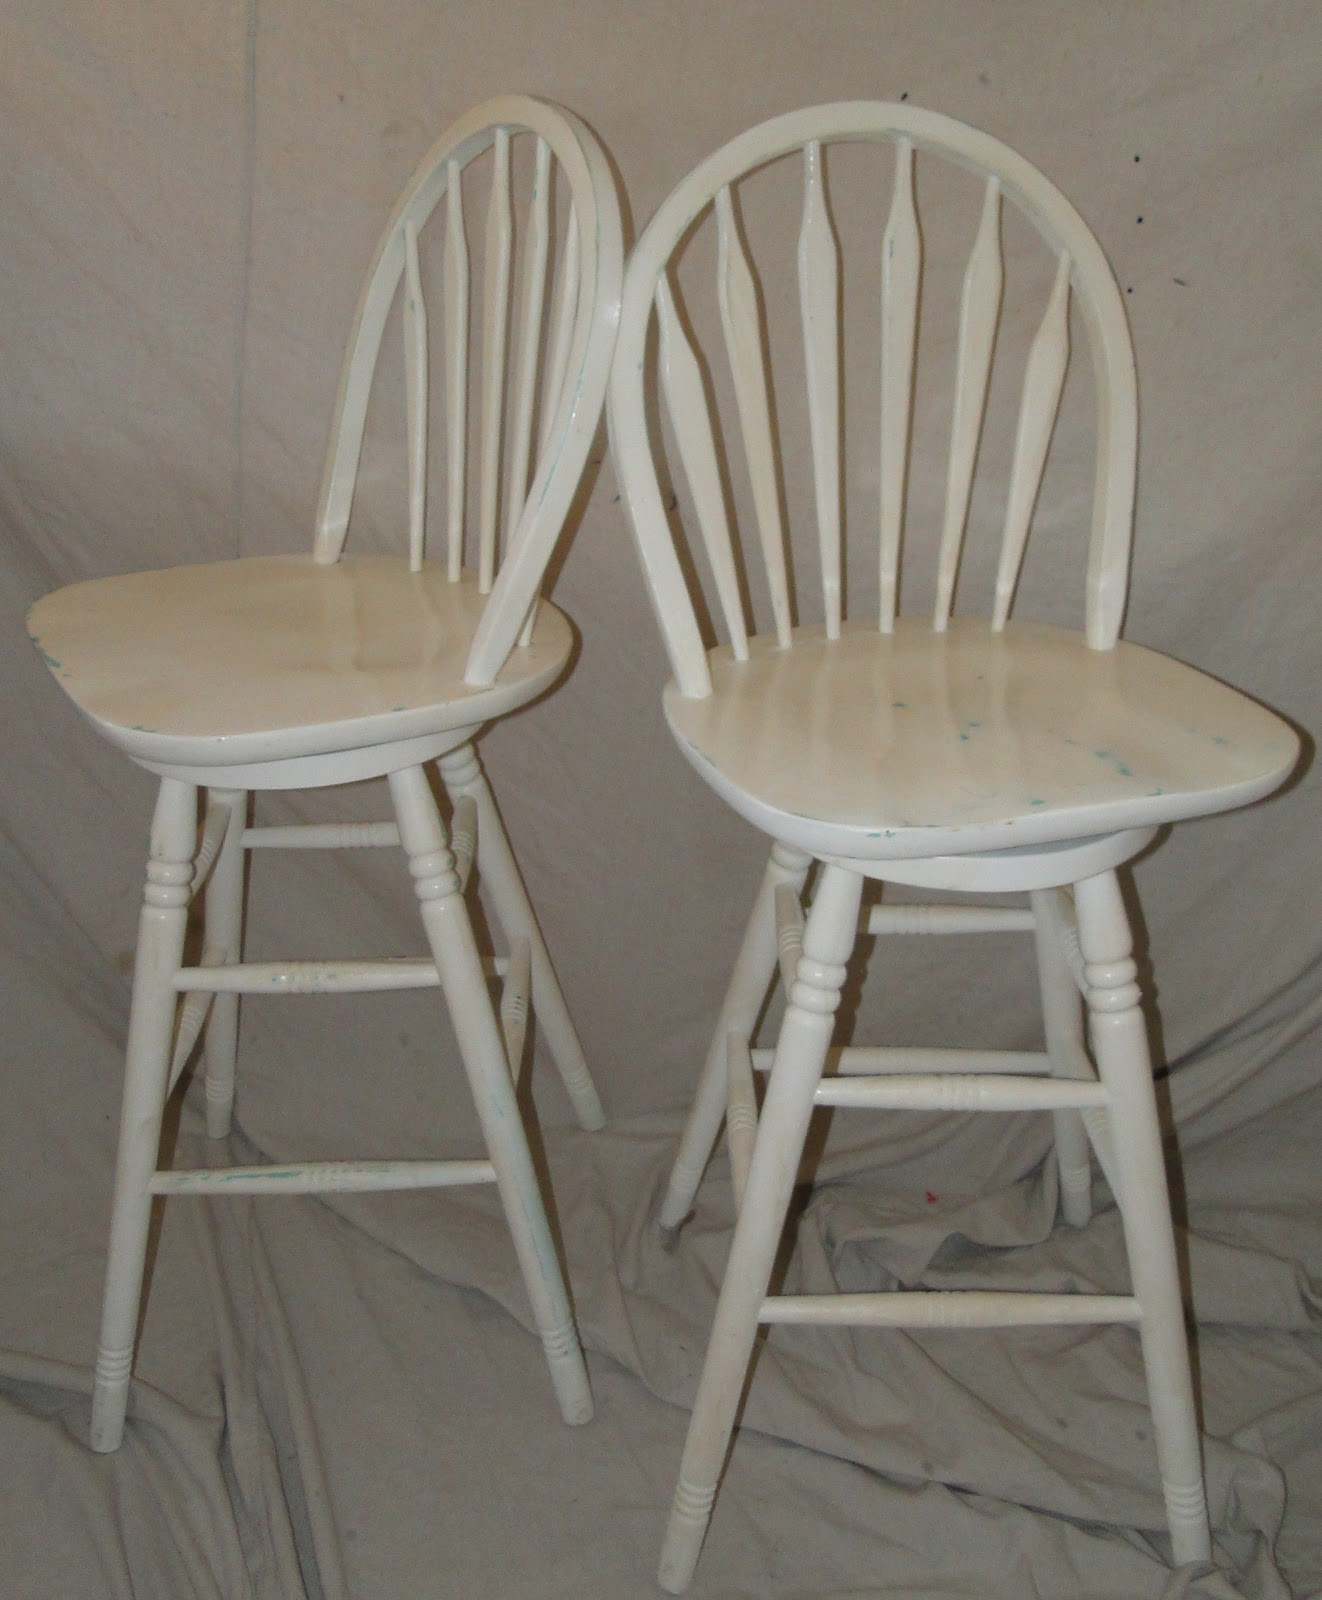 Astounding Ms Funky Junk Shabby Chic Bar Stools 35 Machost Co Dining Chair Design Ideas Machostcouk